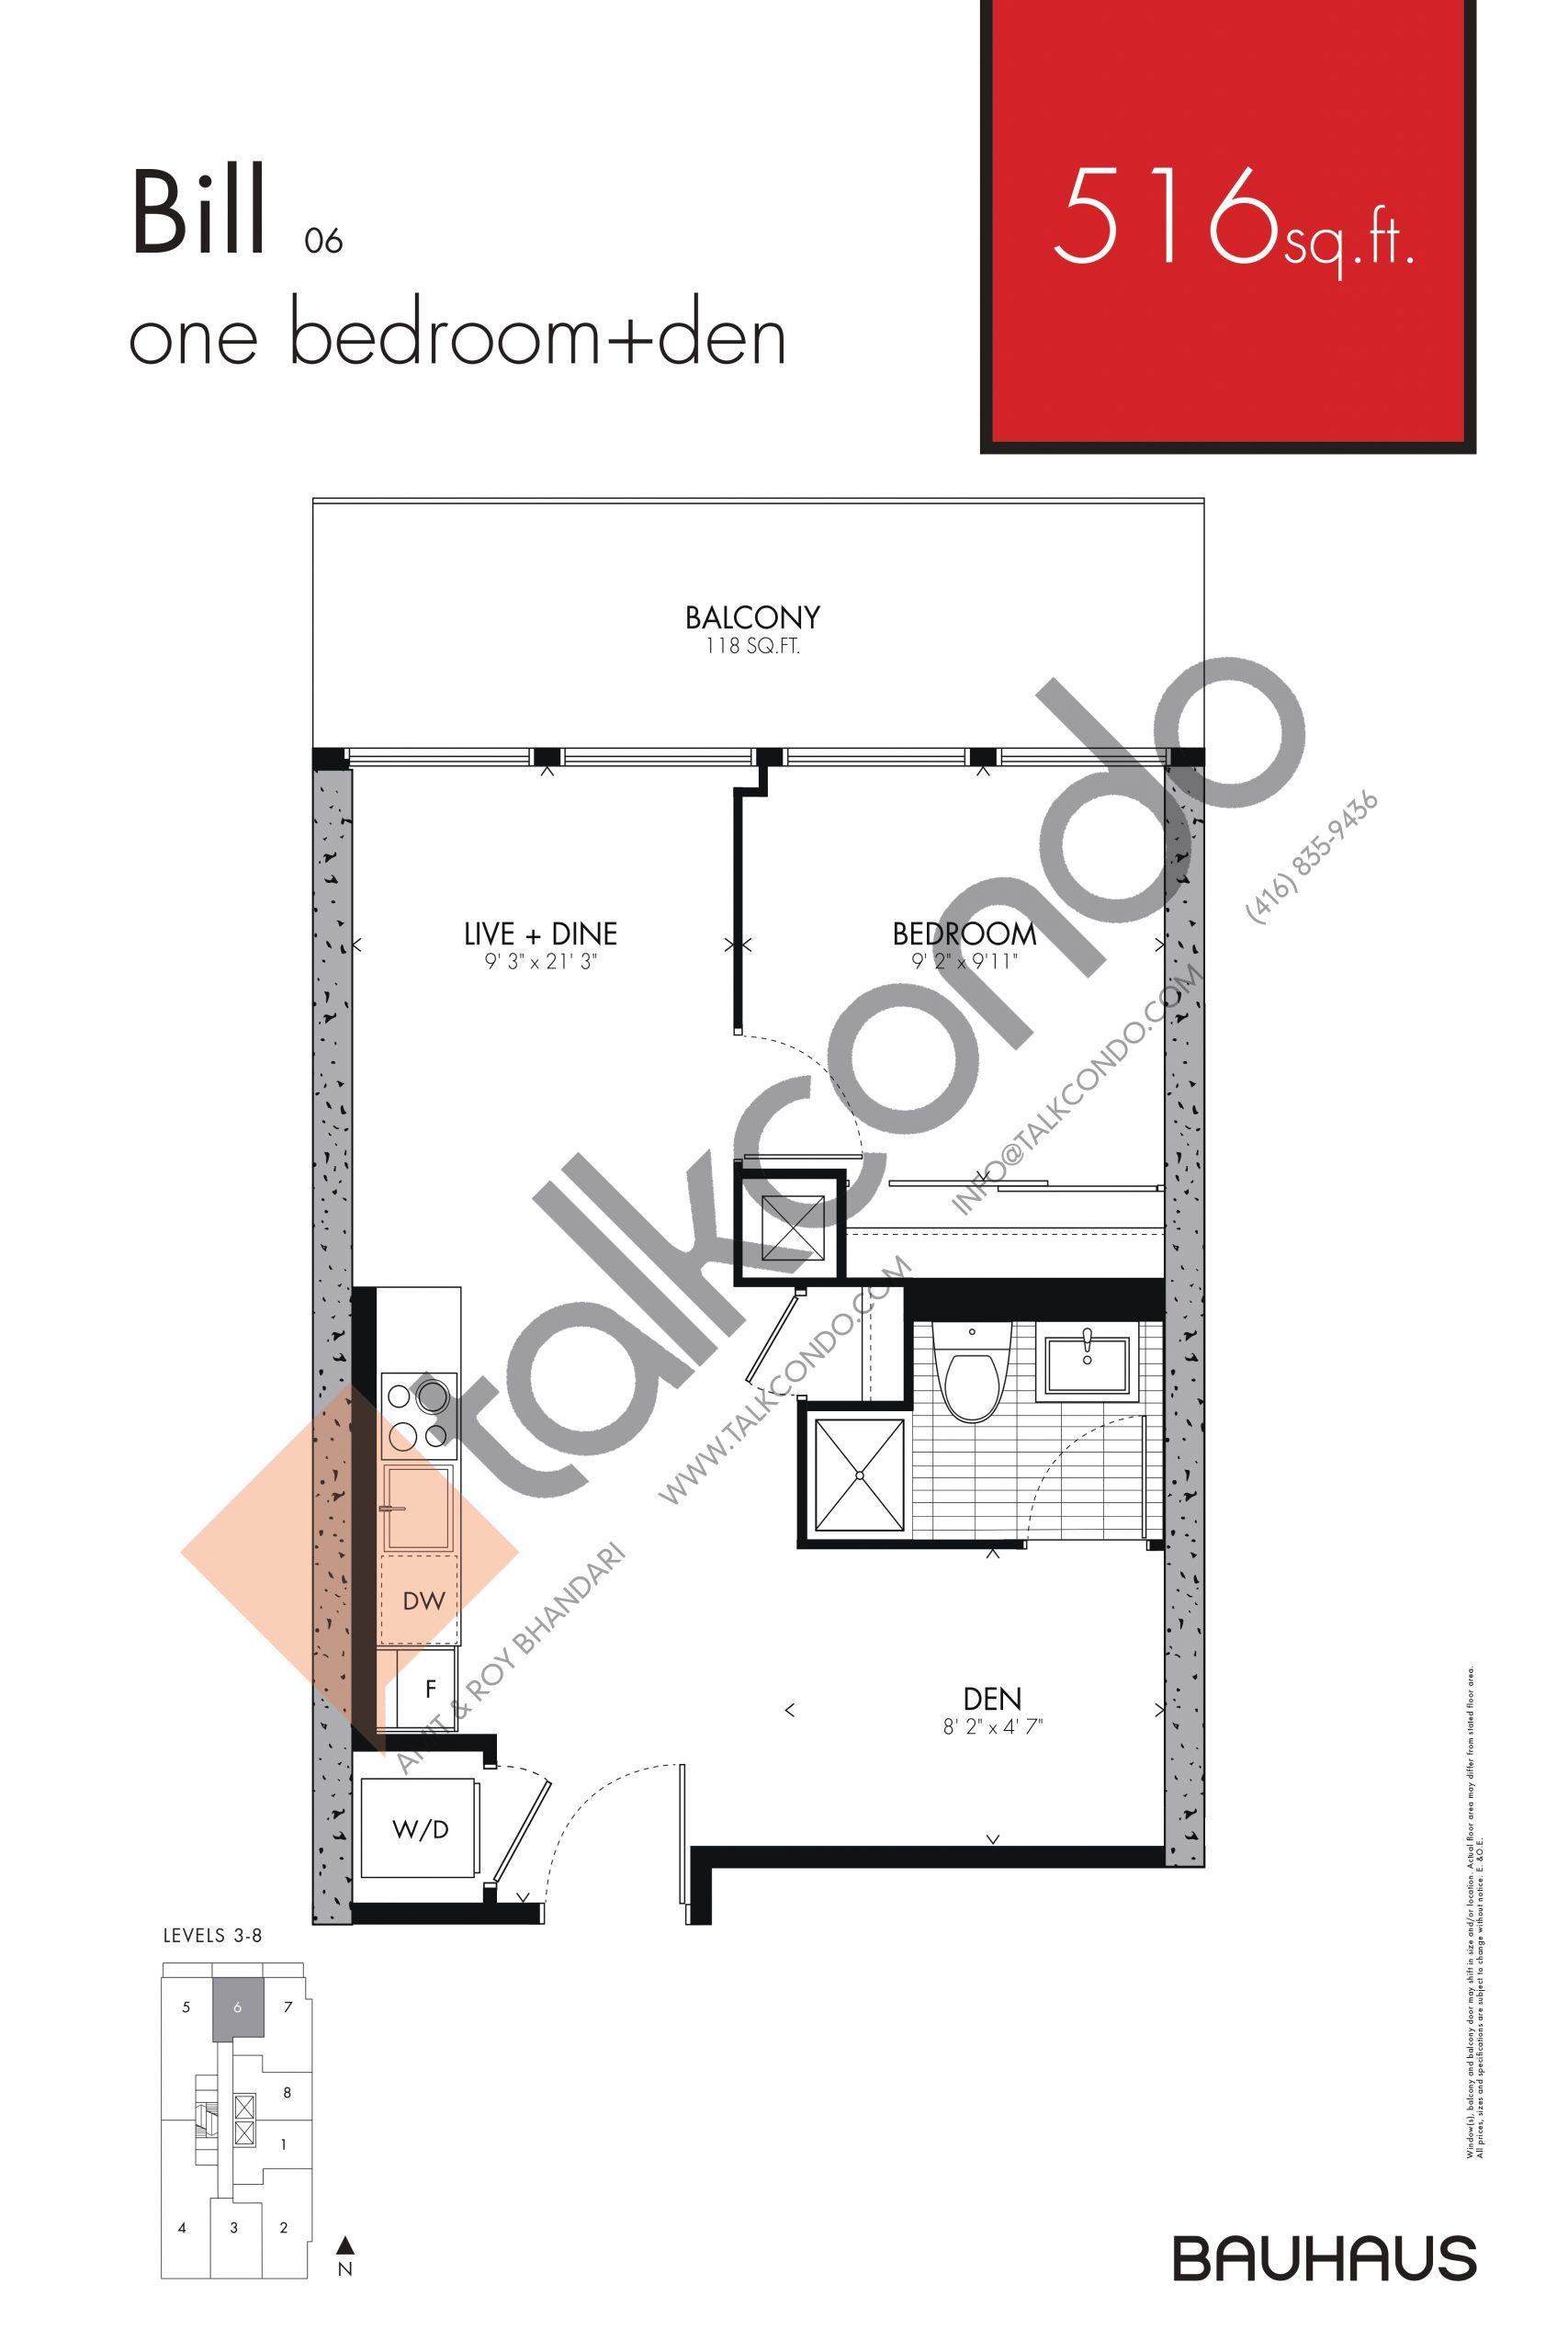 Bill Floor Plan at Bauhaus Condos - 516 sq.ft